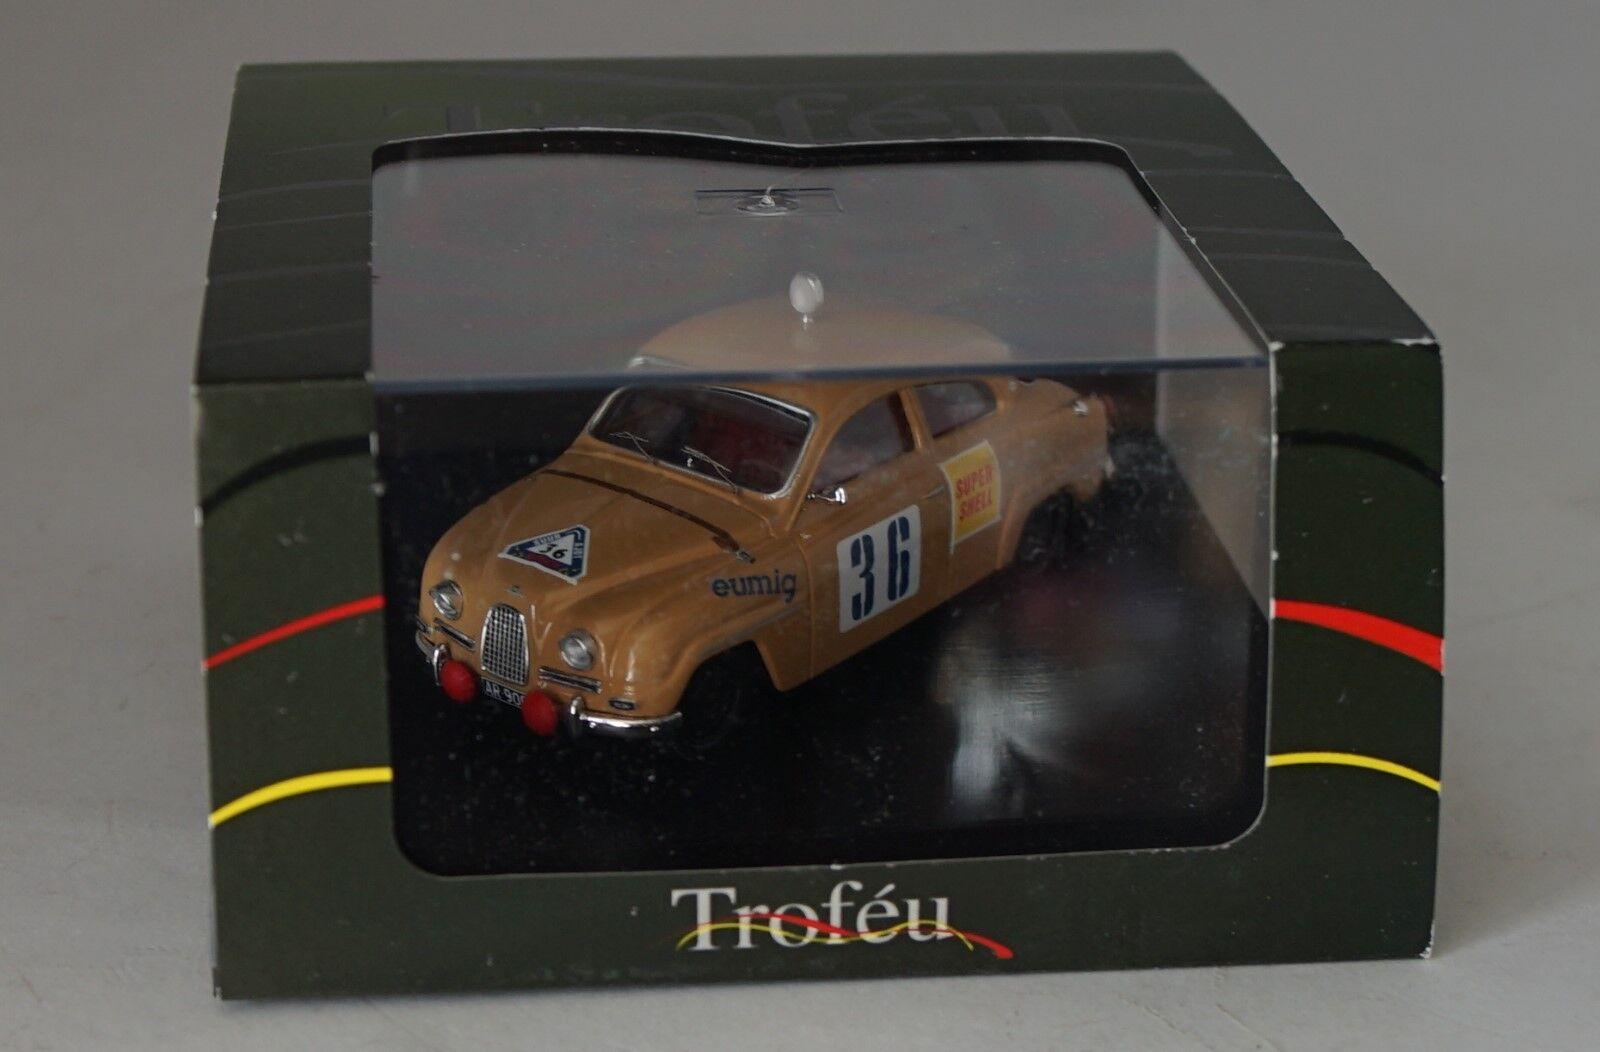 Trofeu 1513 Saab 96  36 Winner 1000 Lacs 1960 - Carl-Otto, Bremer 1 43 Échelle